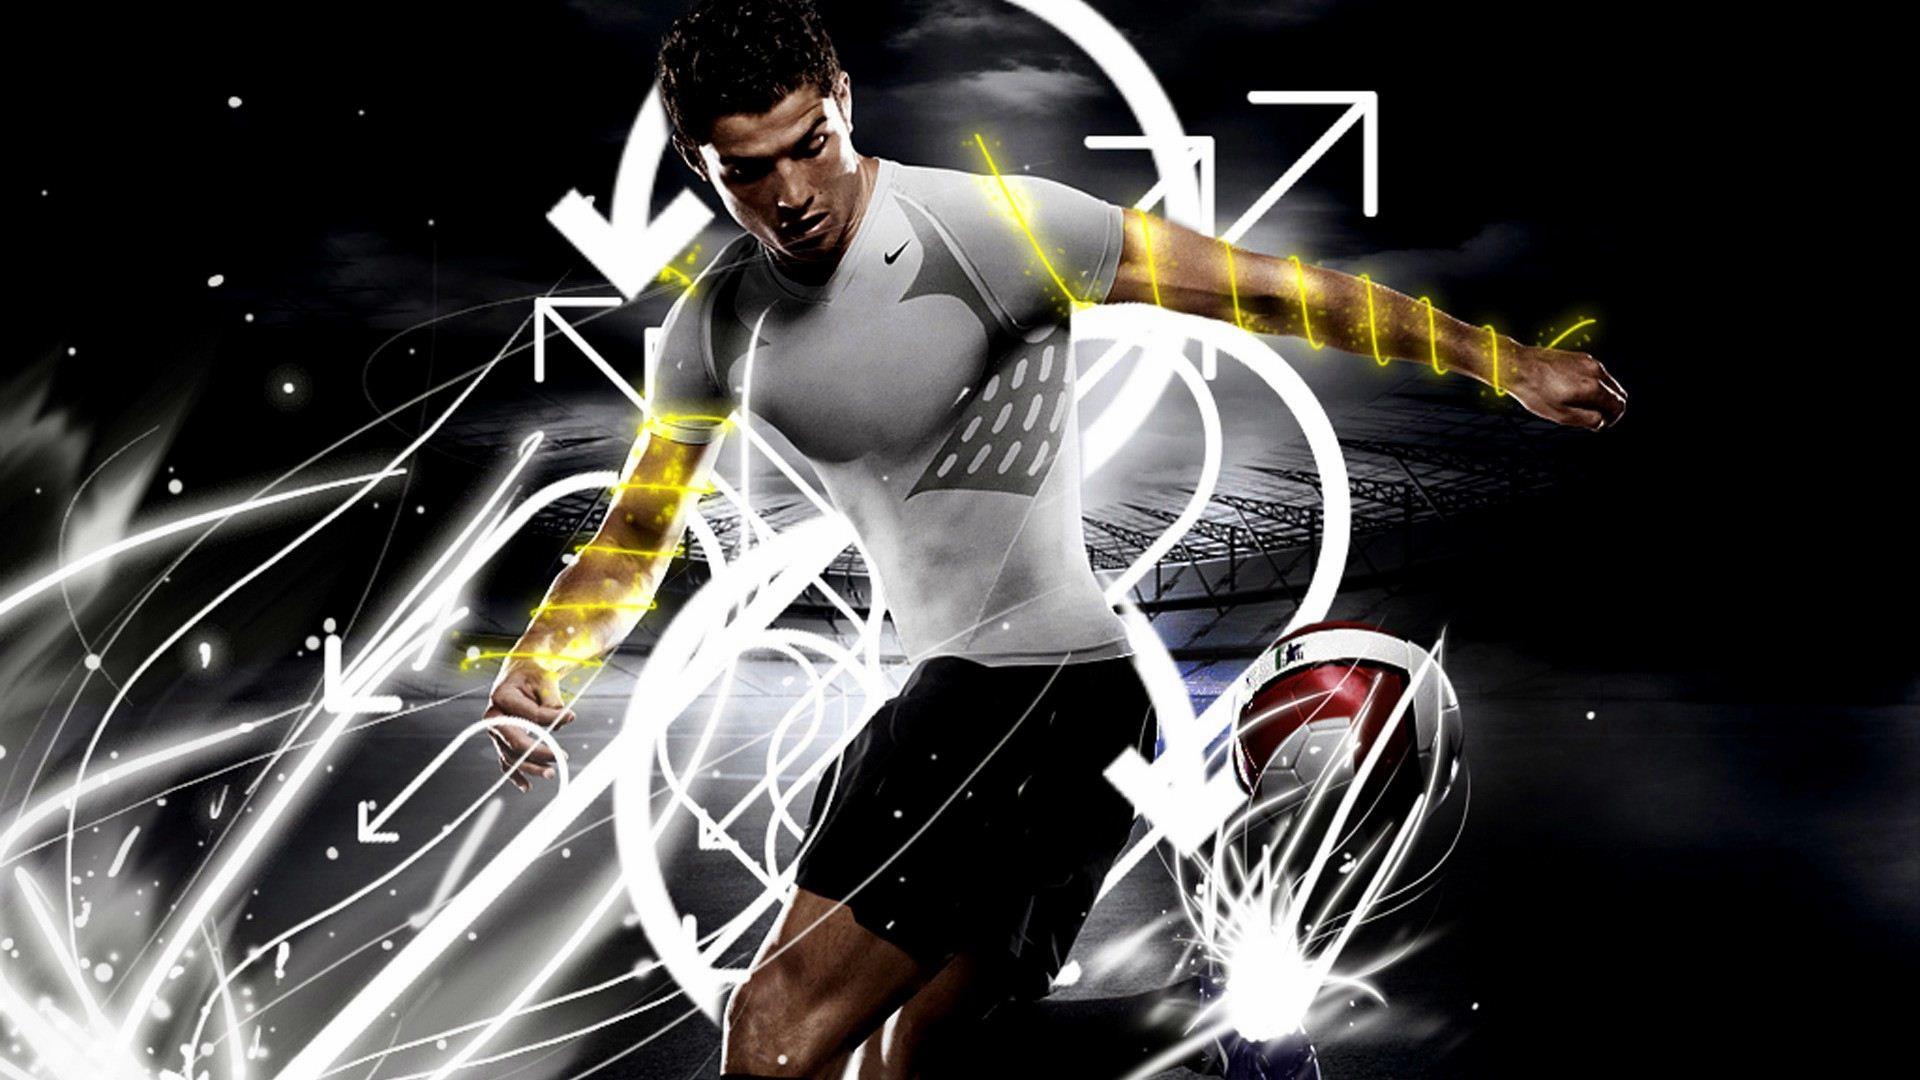 Cristiano Ronaldo Nike wallpaper (3)